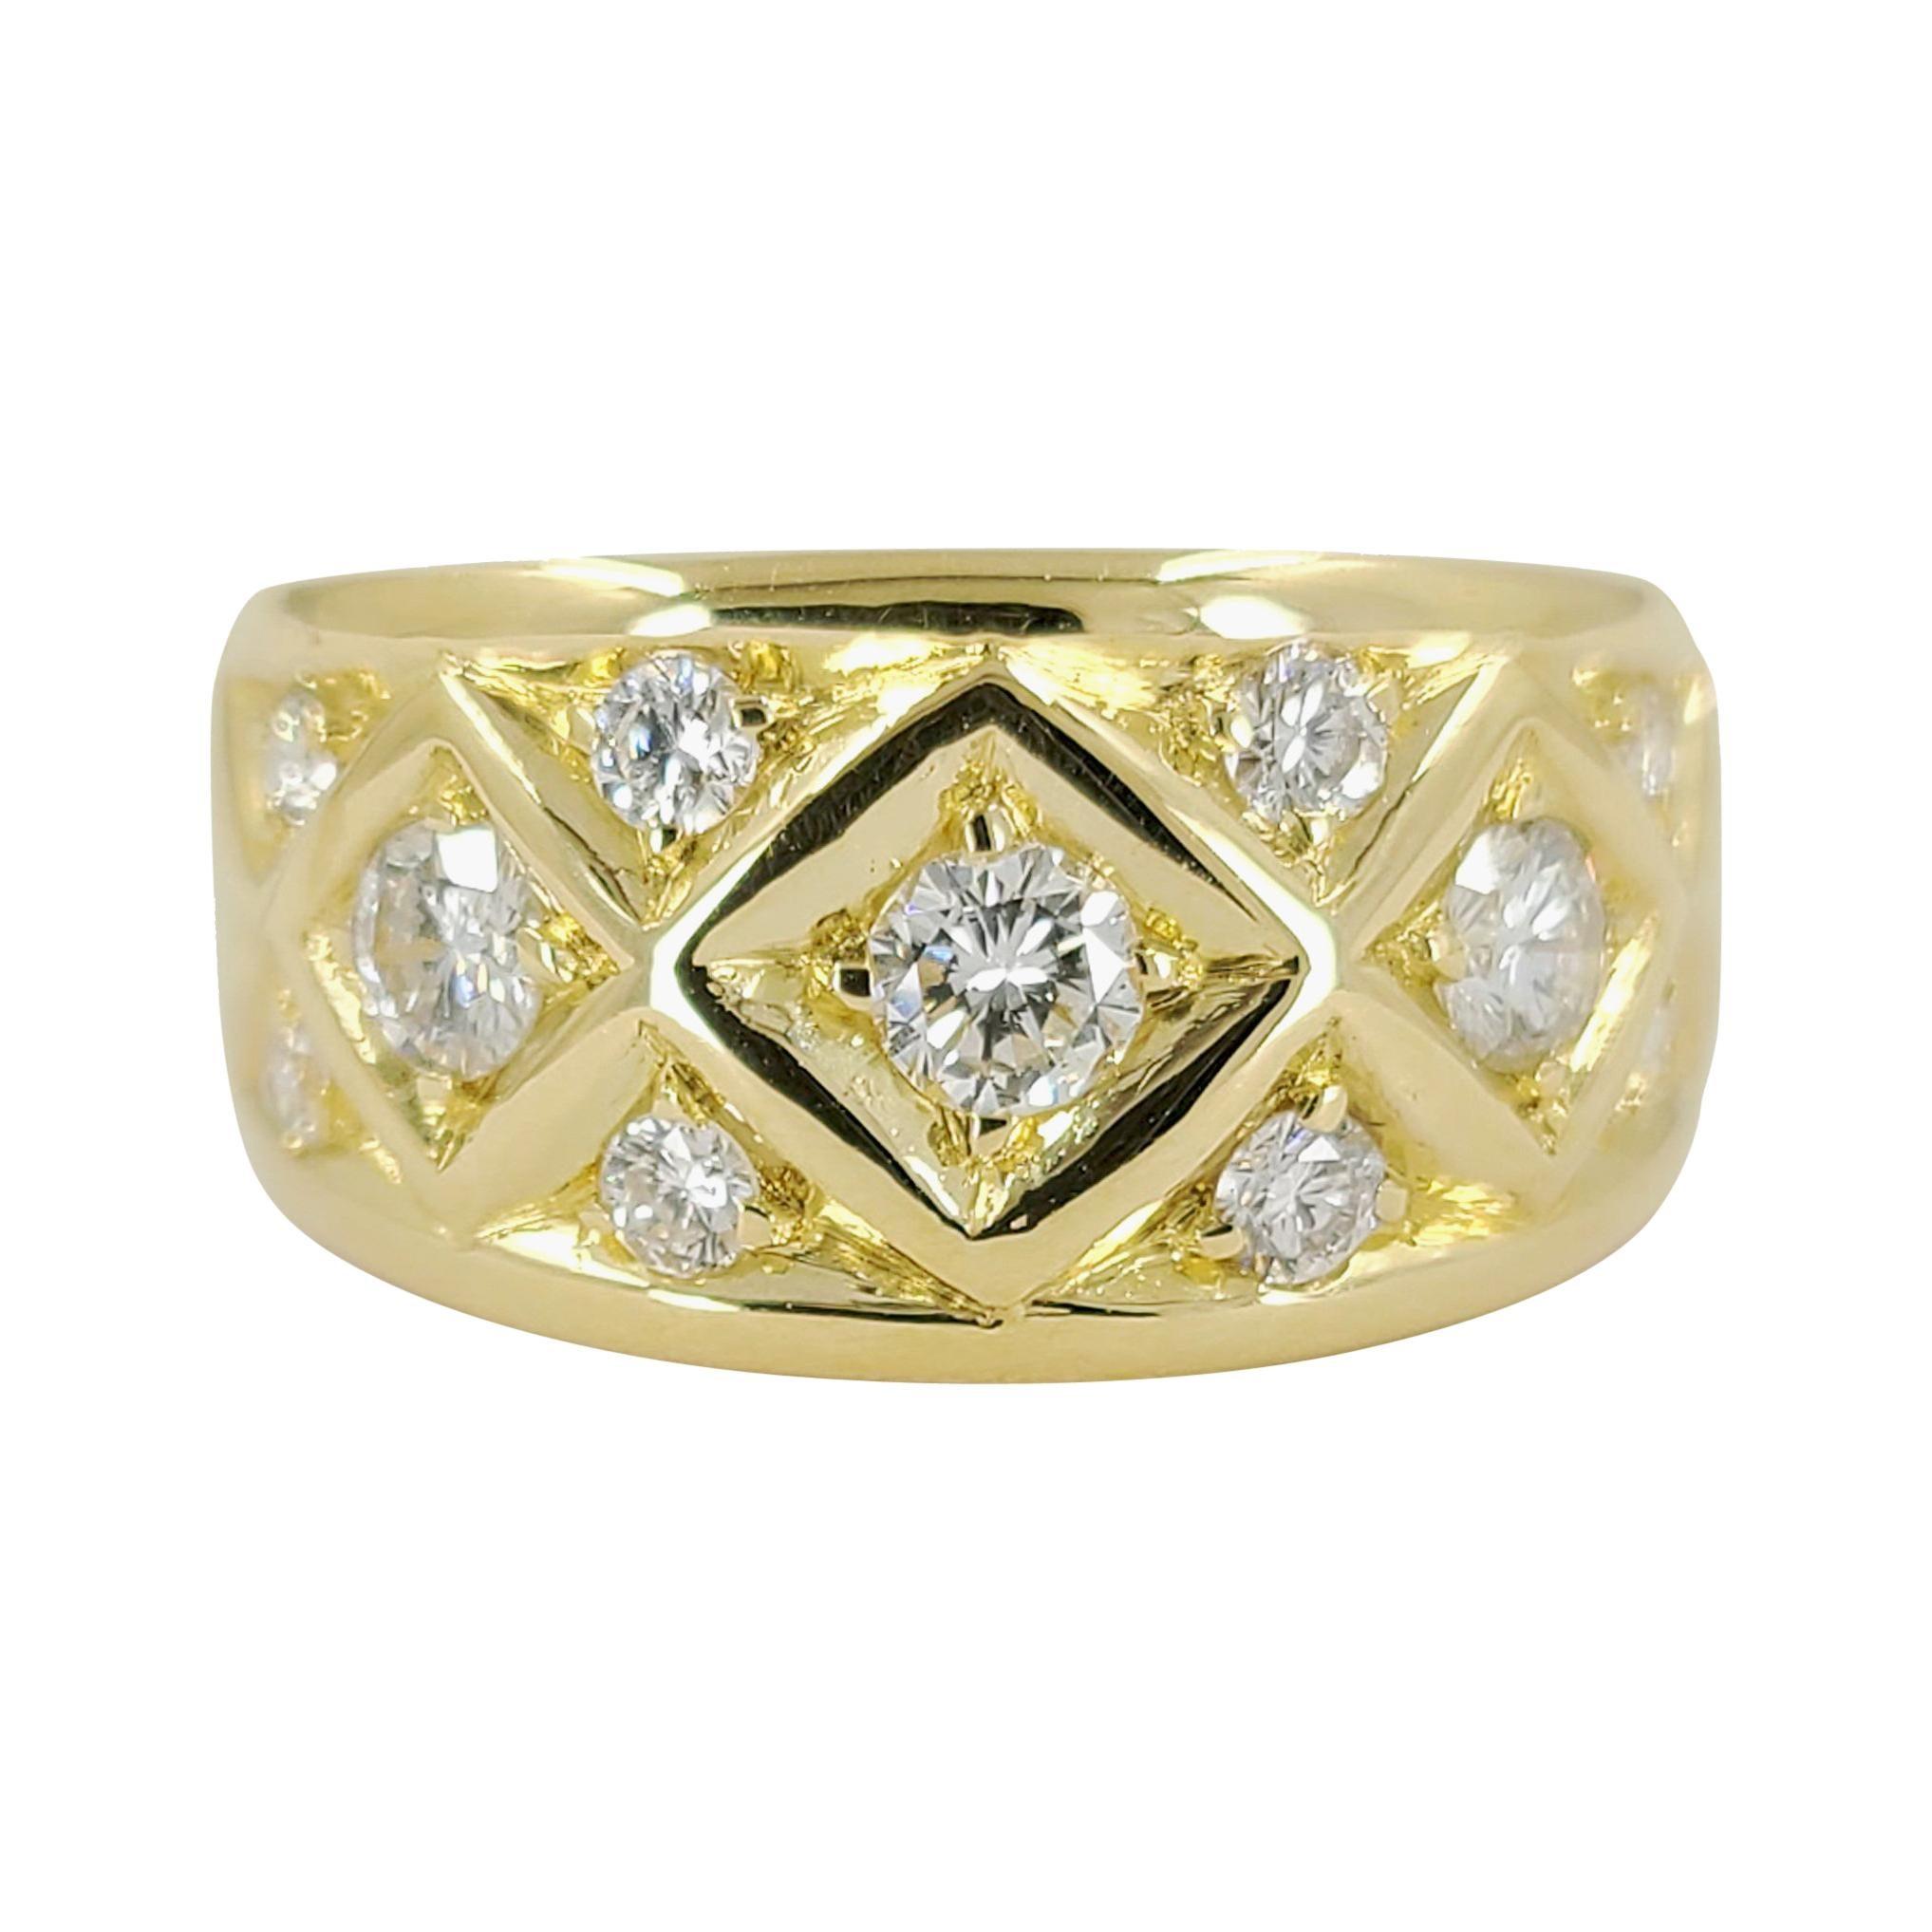 18 Karat Yellow Gold Wide Diamond Band Ring